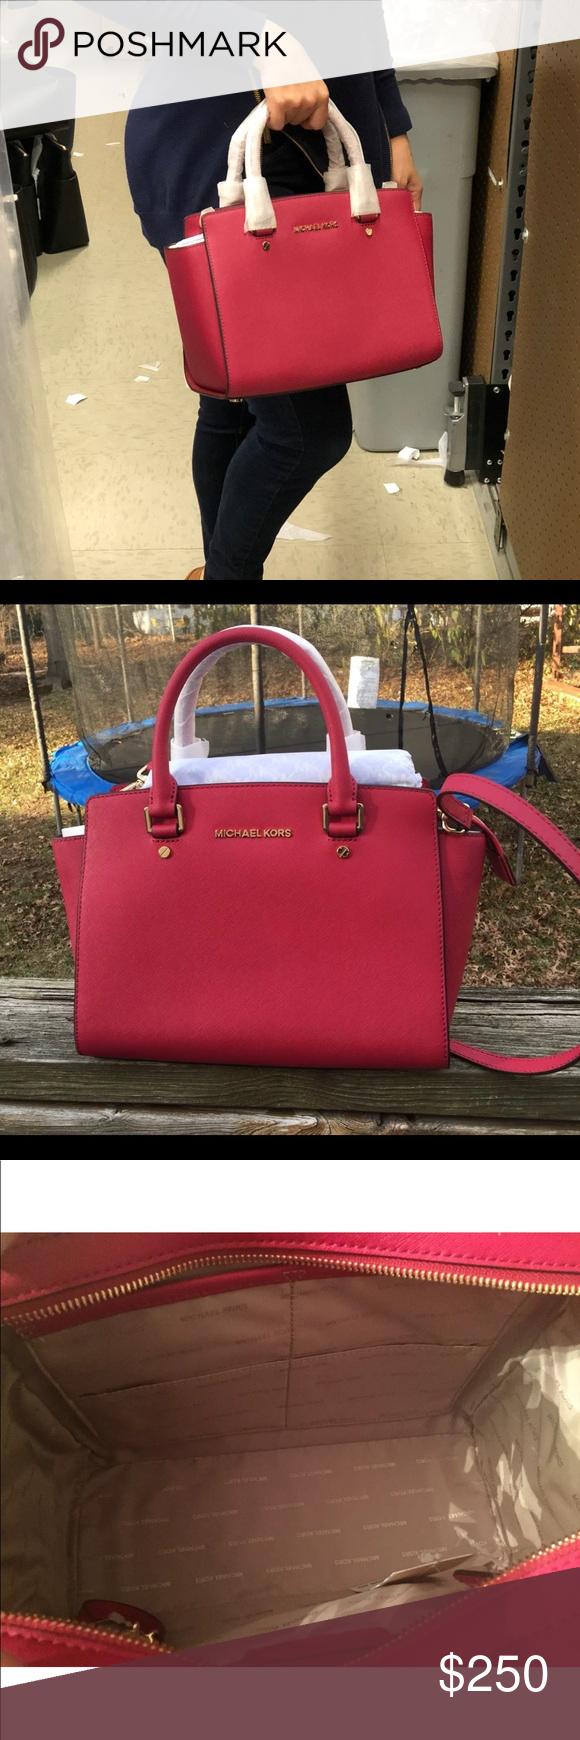 c16c3f2bb602 Michael kors cranberry Selma medium satchel bag Get a handle on timeless  style with treasured Selma